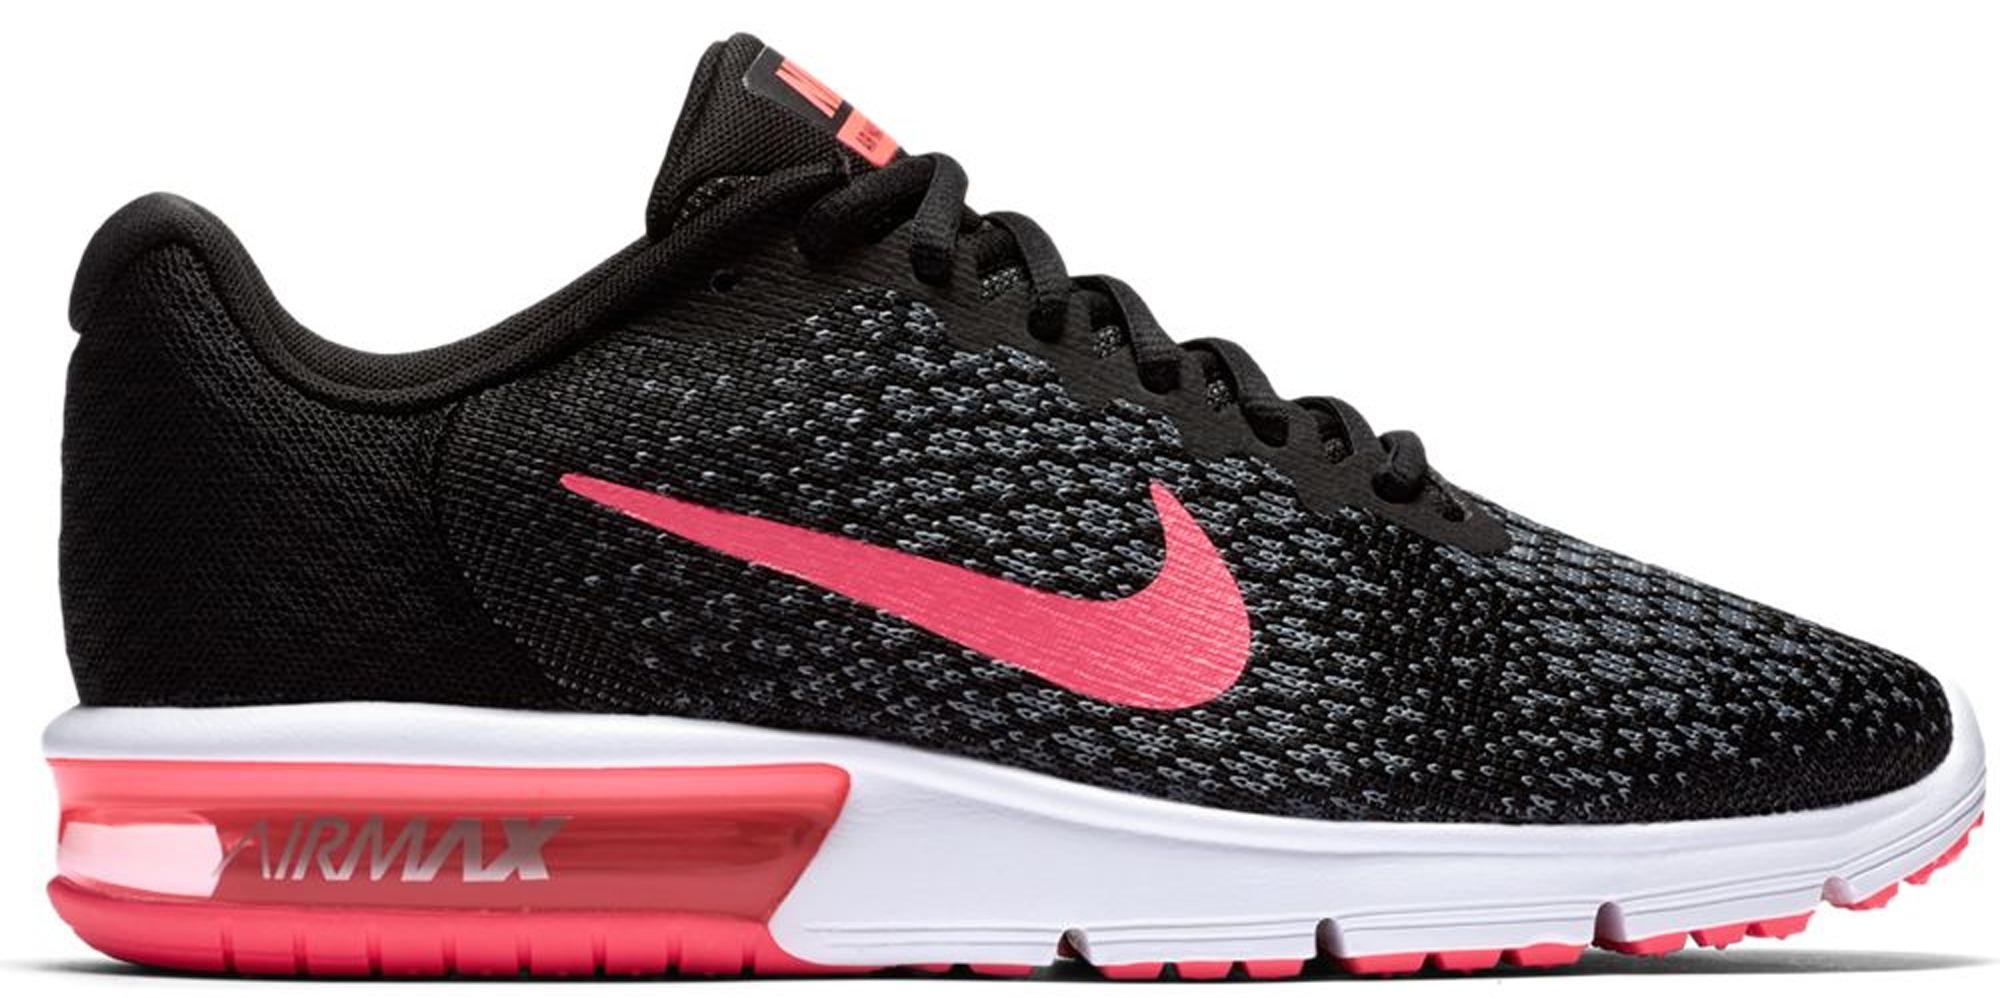 Nike Air Max Sequent 2 Black Vivid Pink